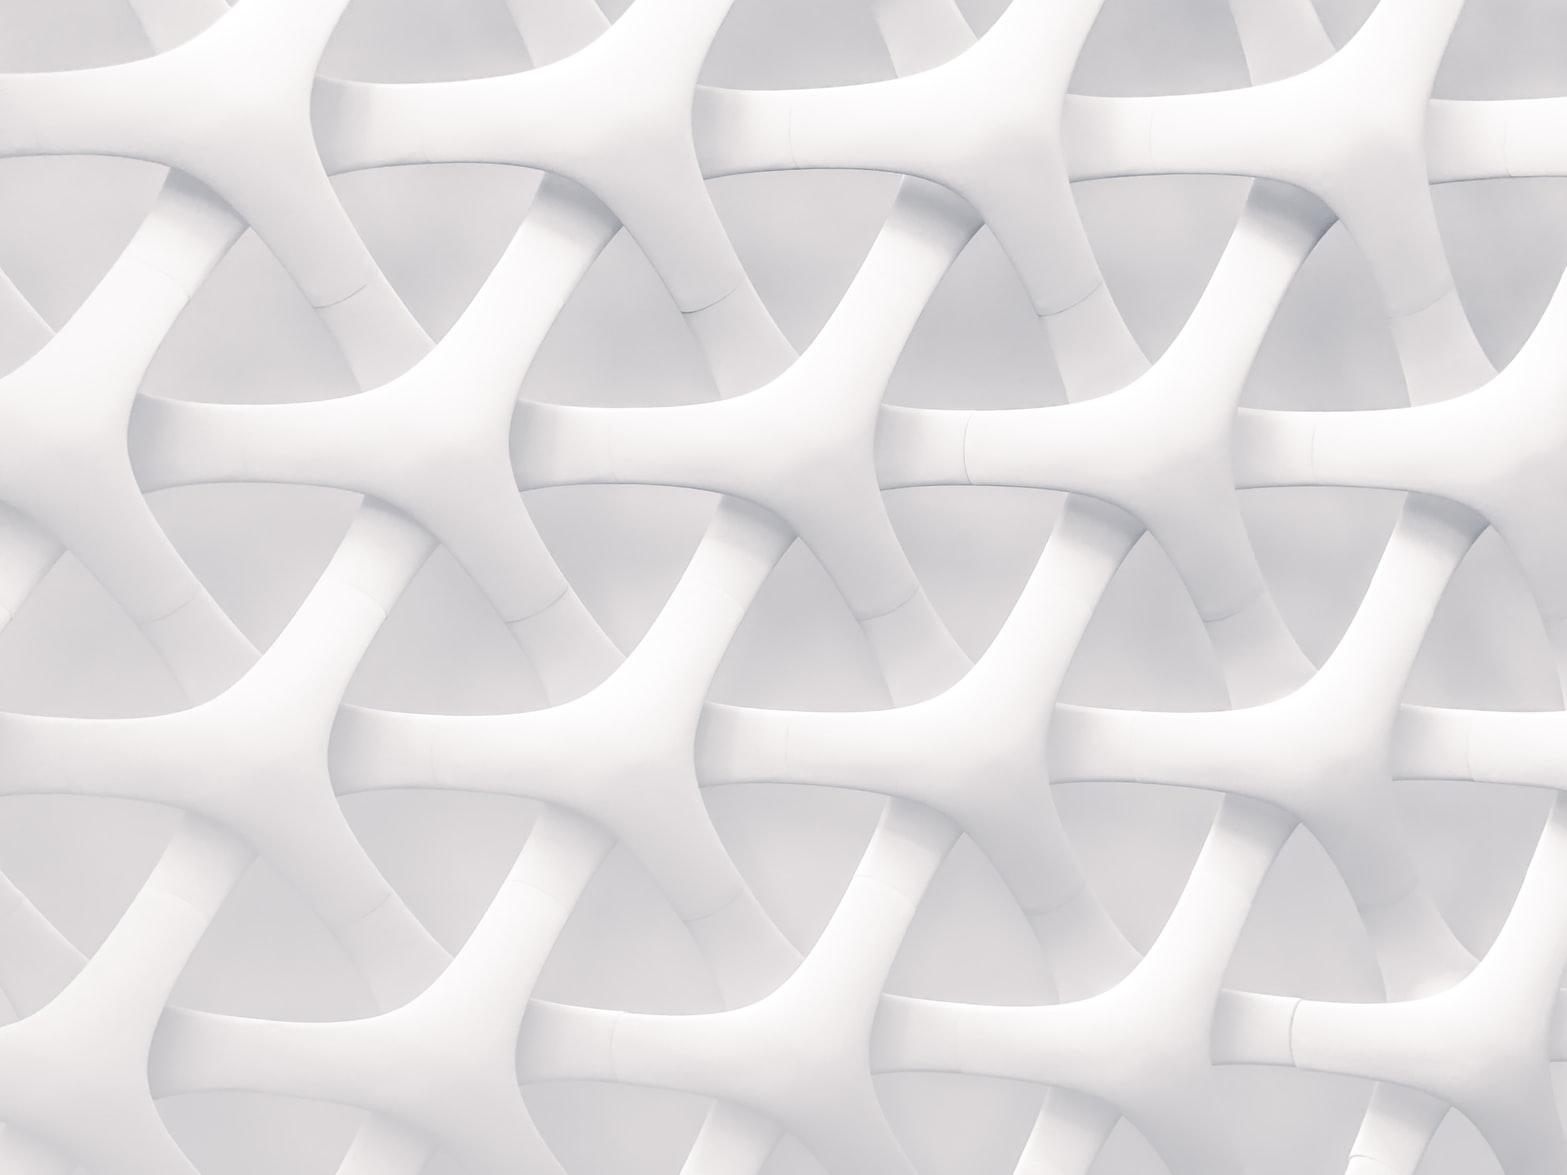 textured white linkedin background